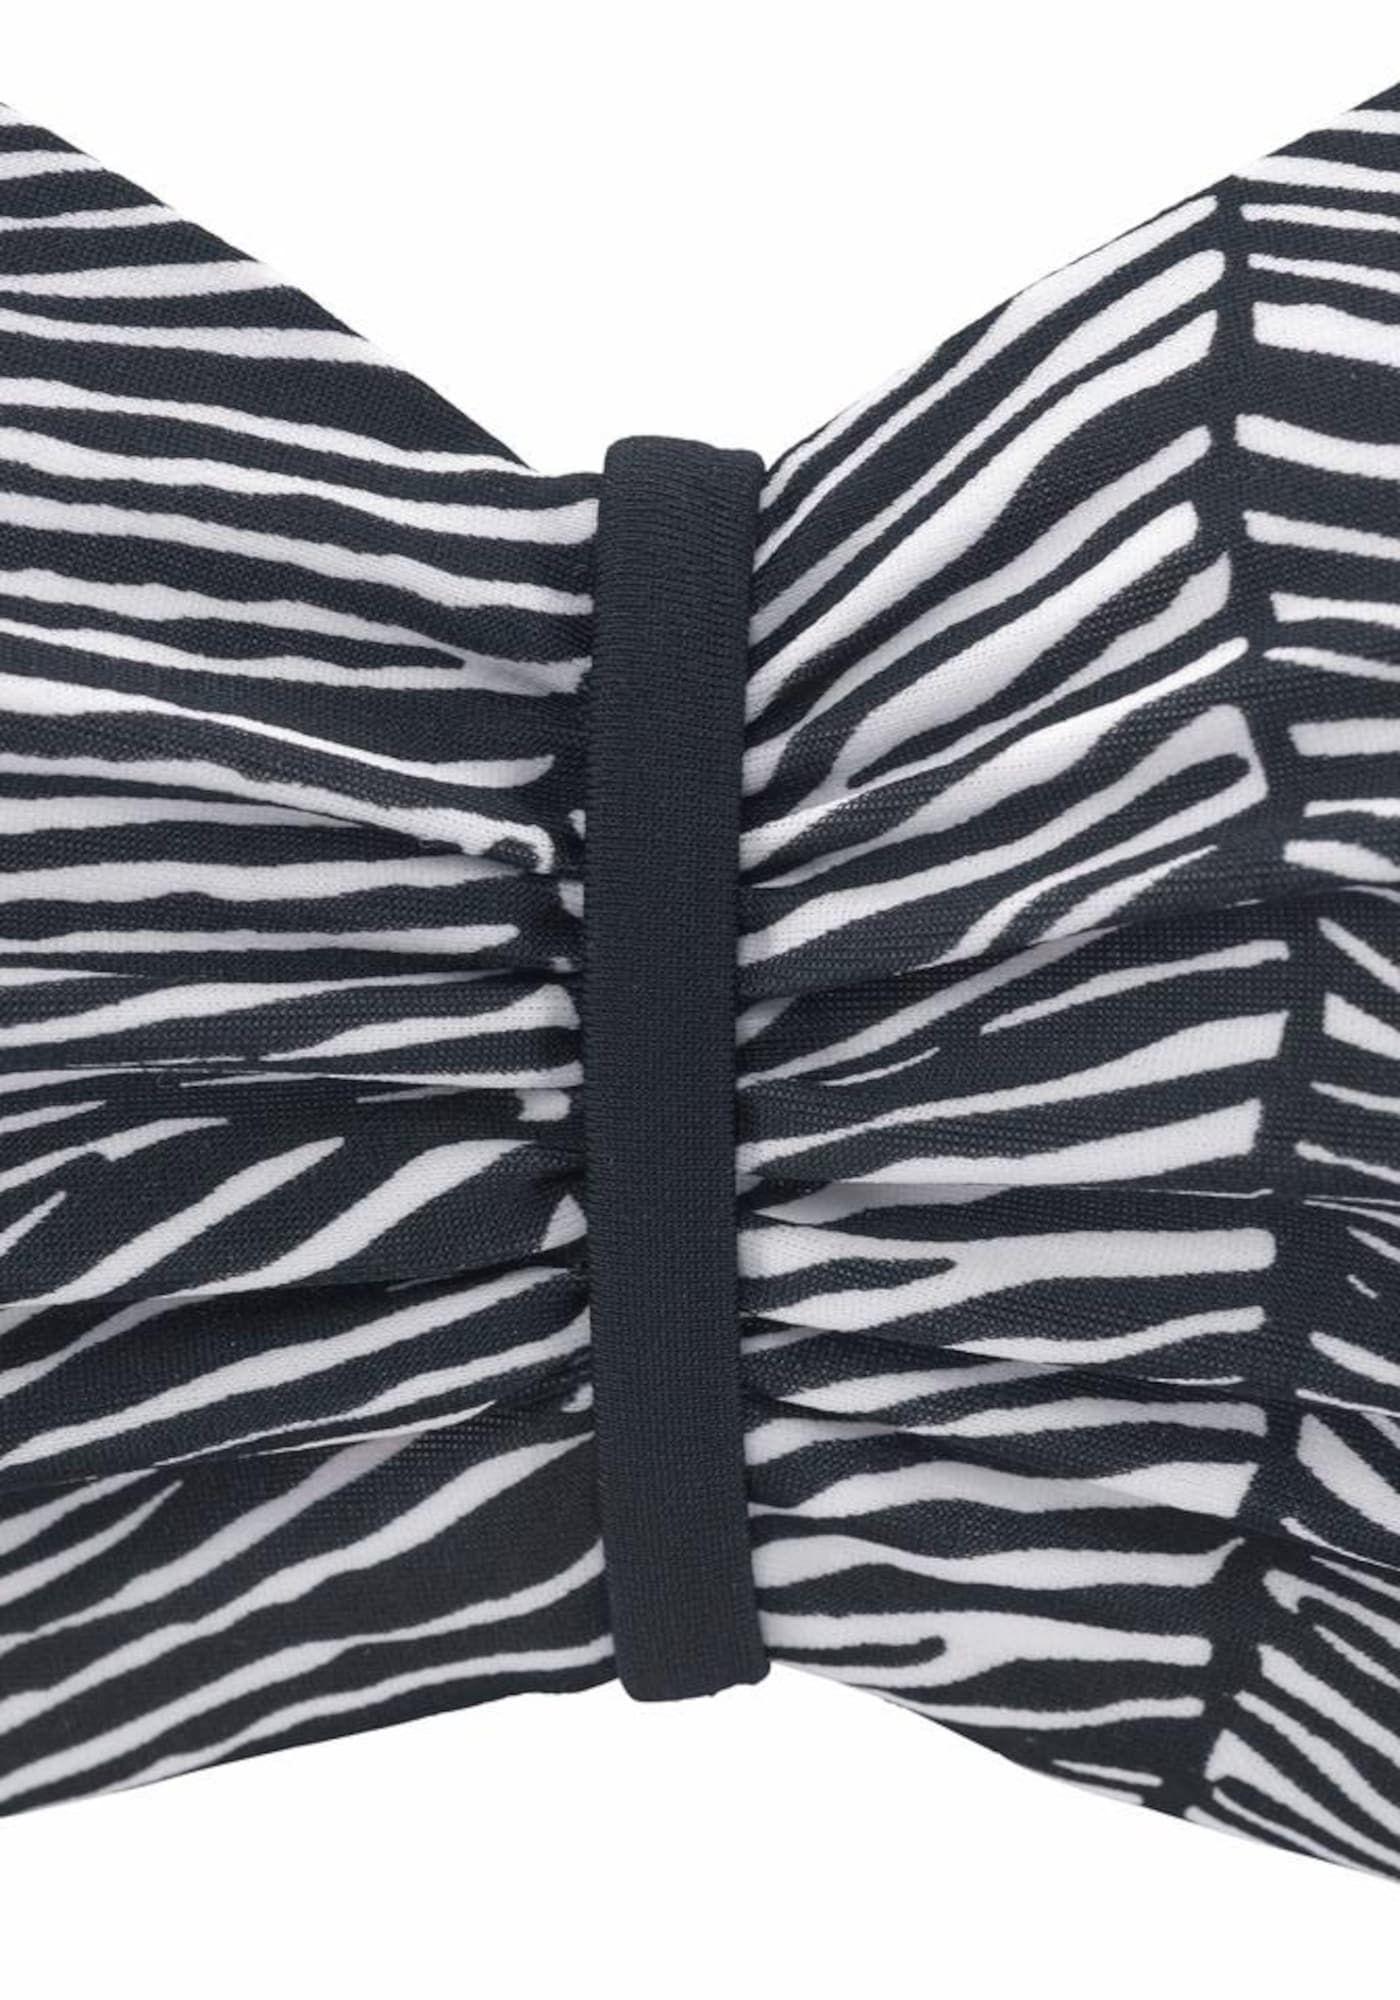 Photo of VENICE BEACH underwire bandeau top 'Sugar' in black and white